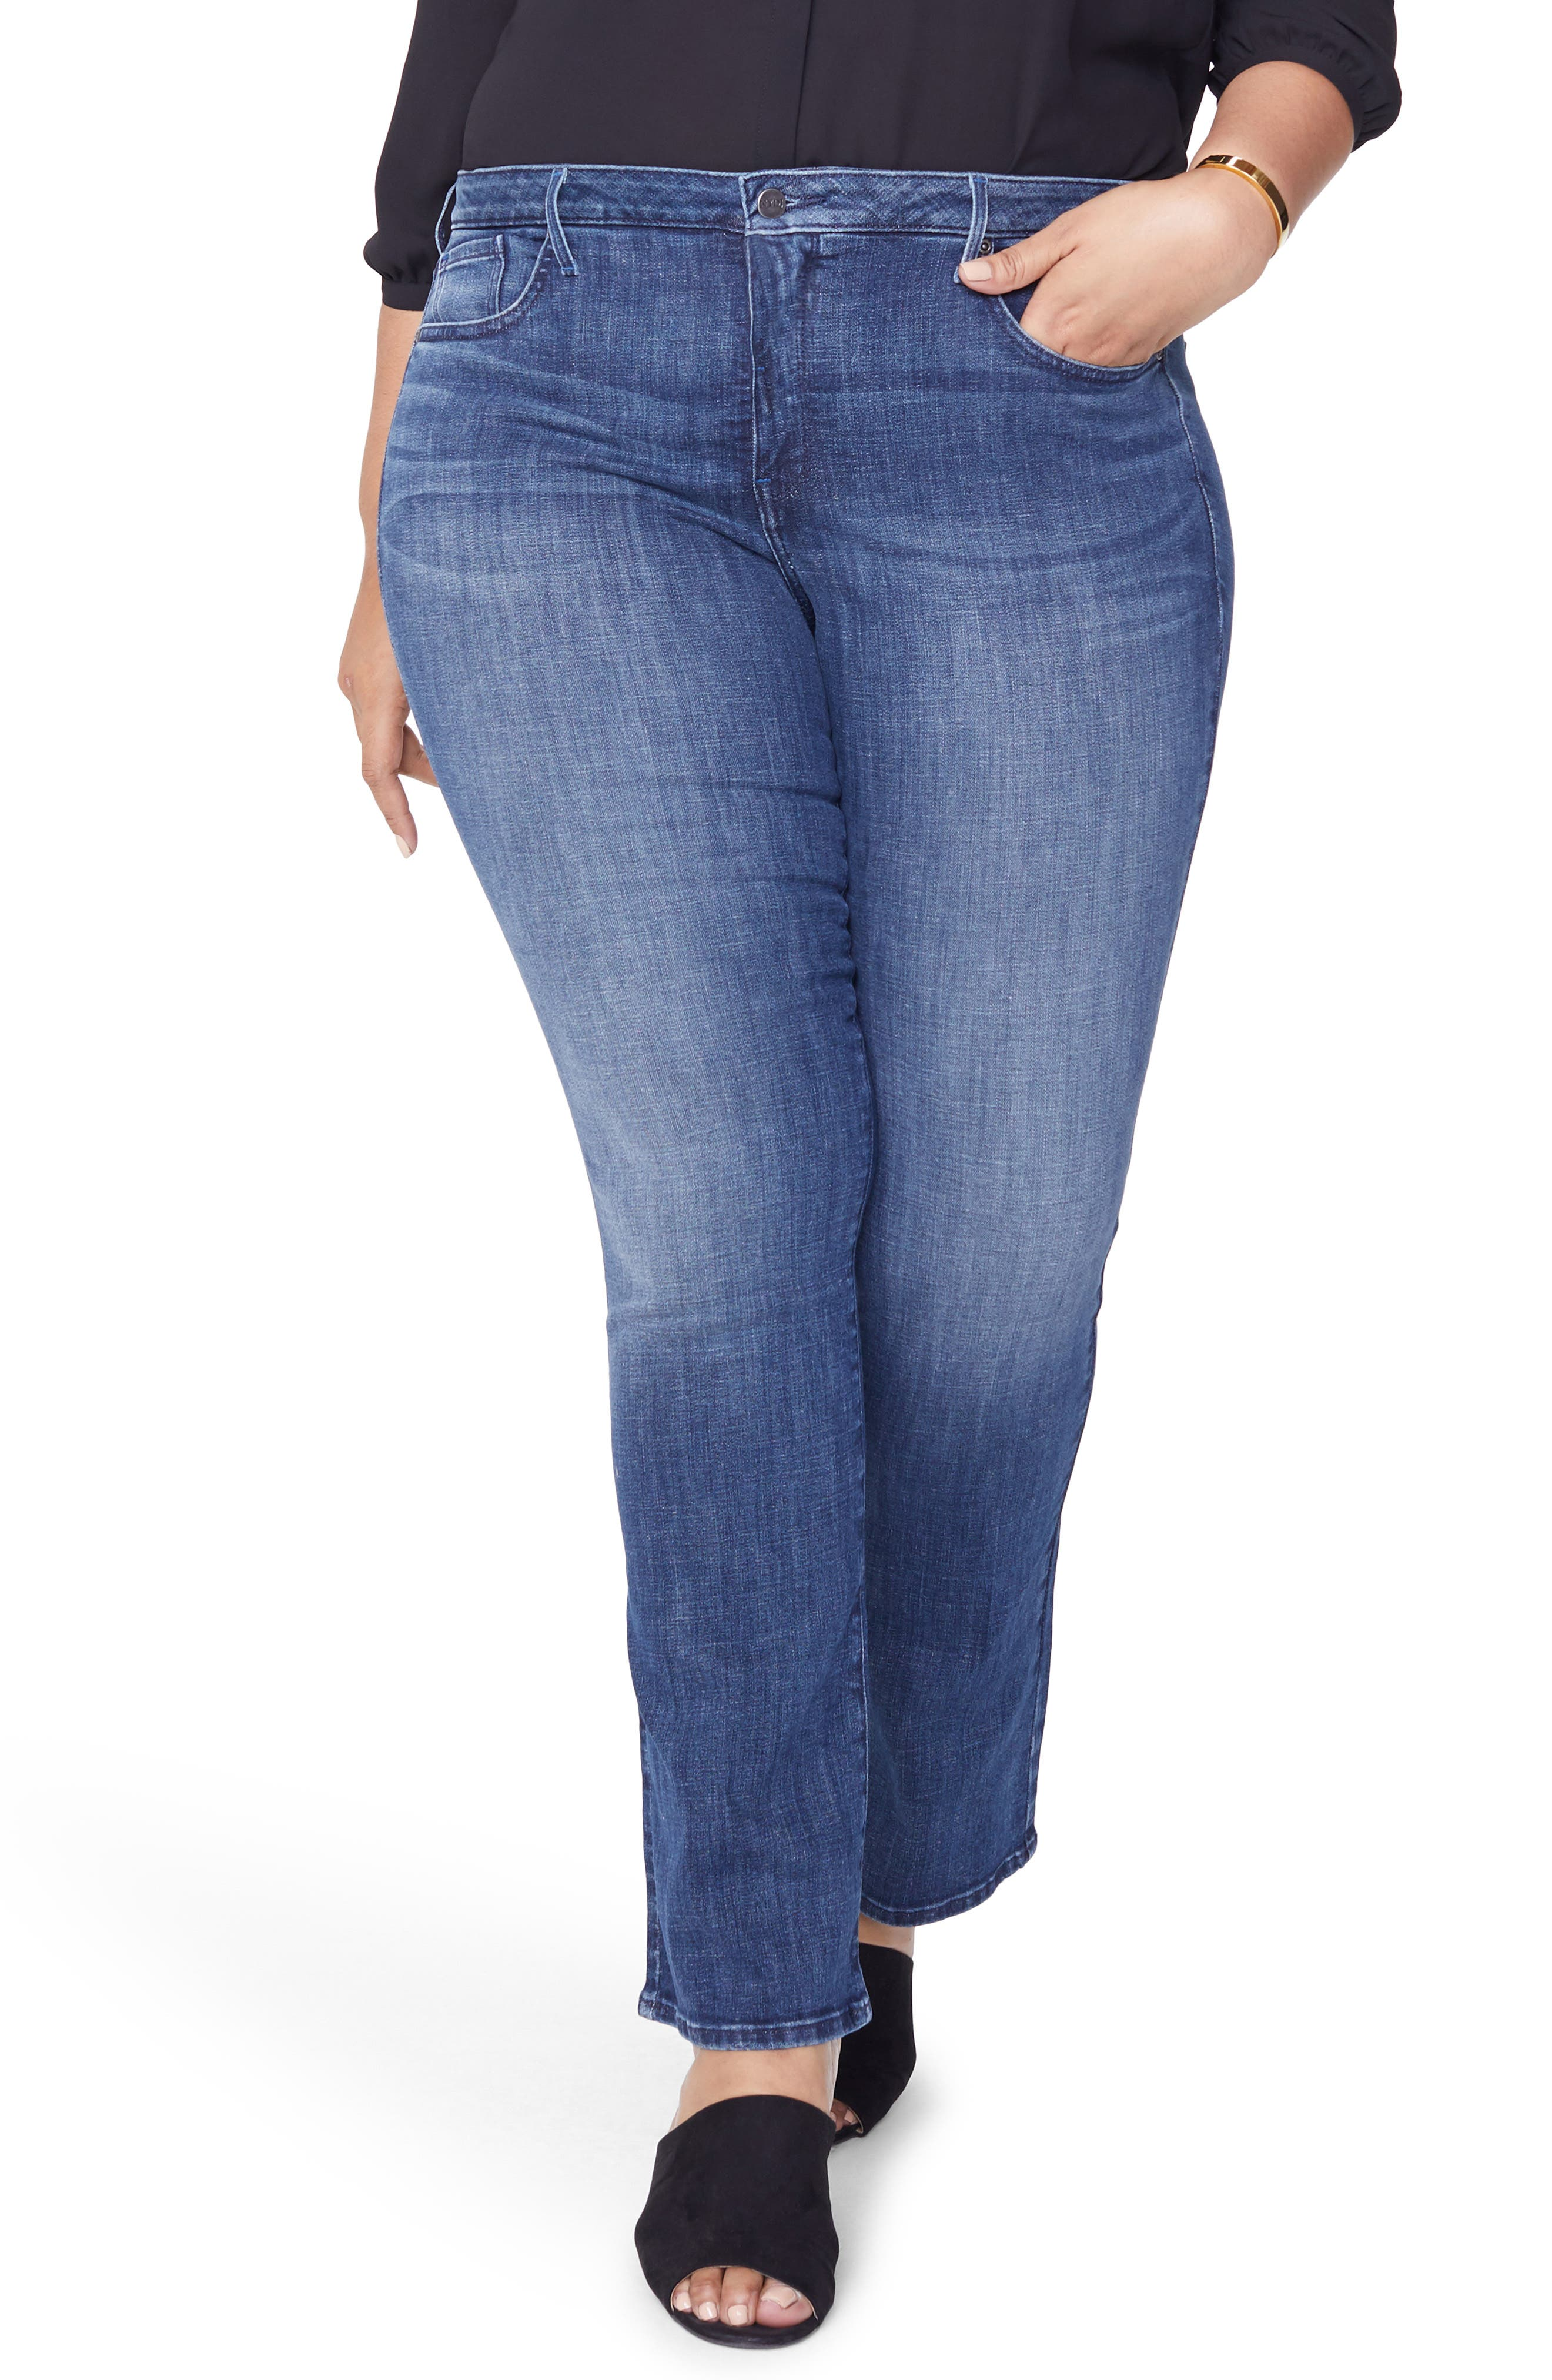 Barbara Bootcut Jeans,                             Main thumbnail 1, color,                             LUPINE